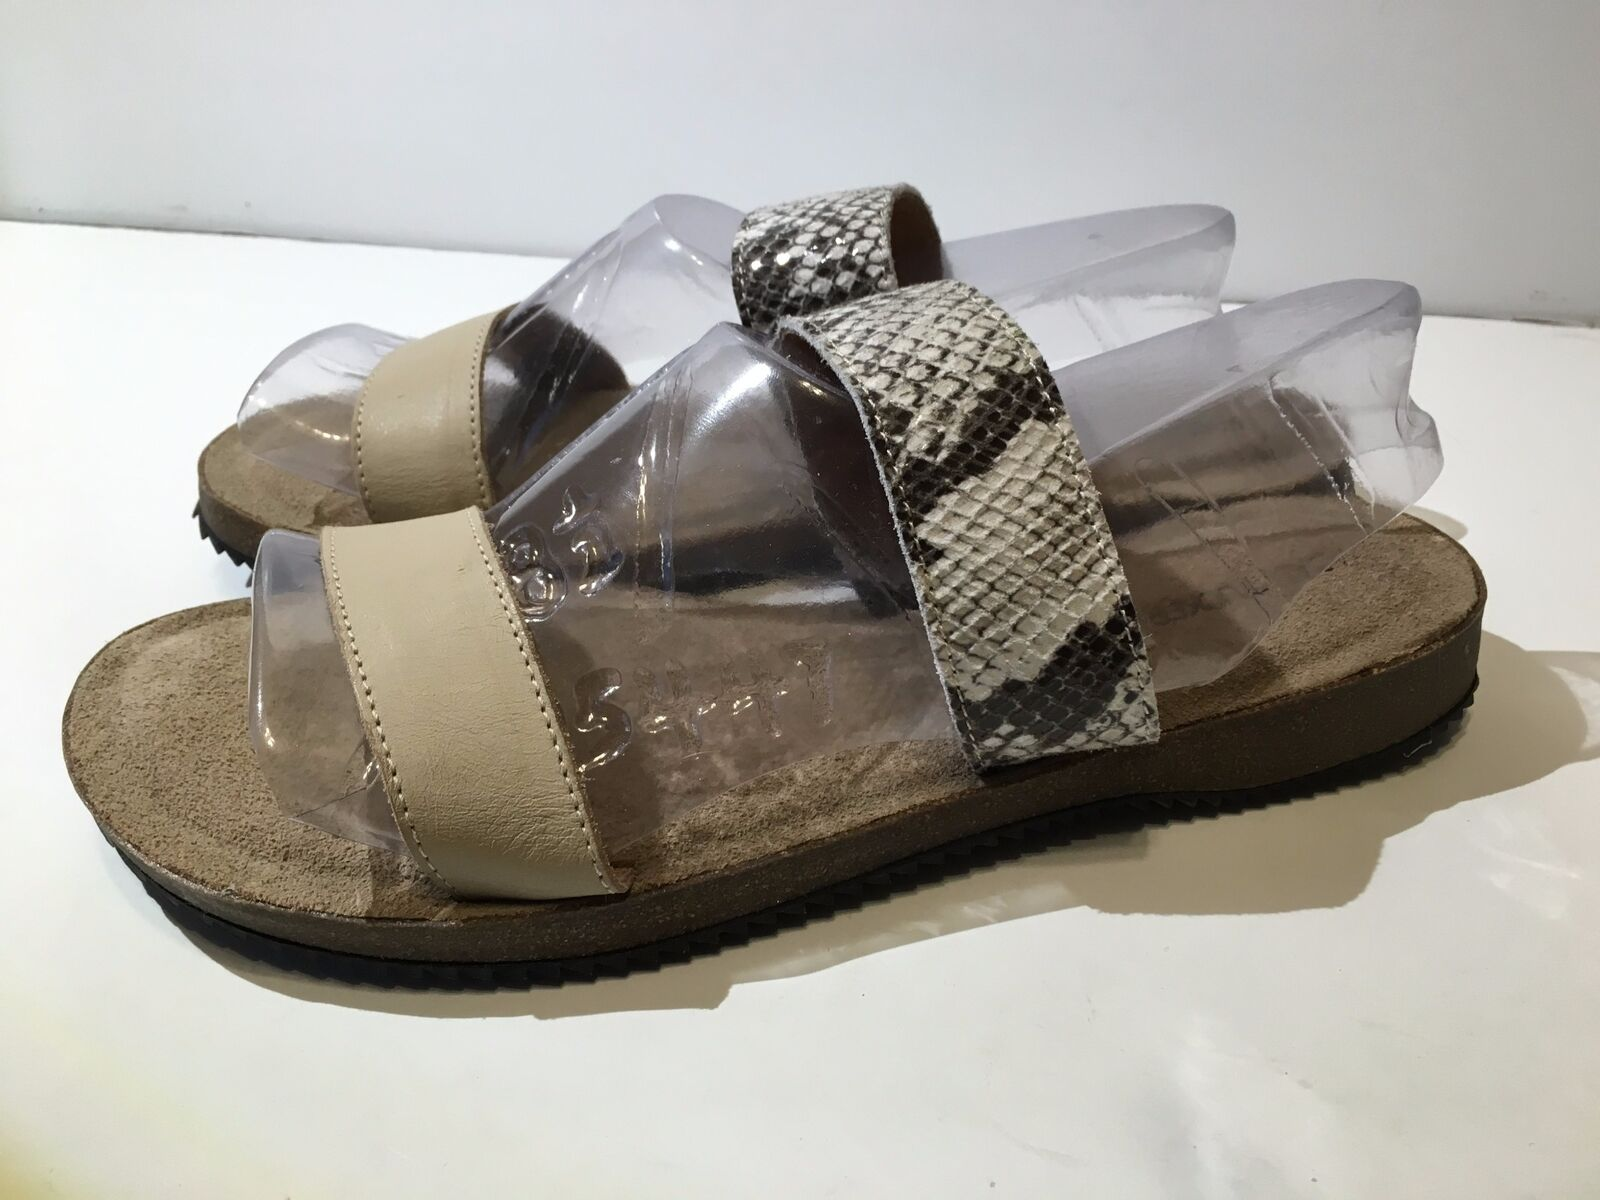 Adam Tucker Autumn 10 Tan Snake Leather Sandal (974) Size 9.5